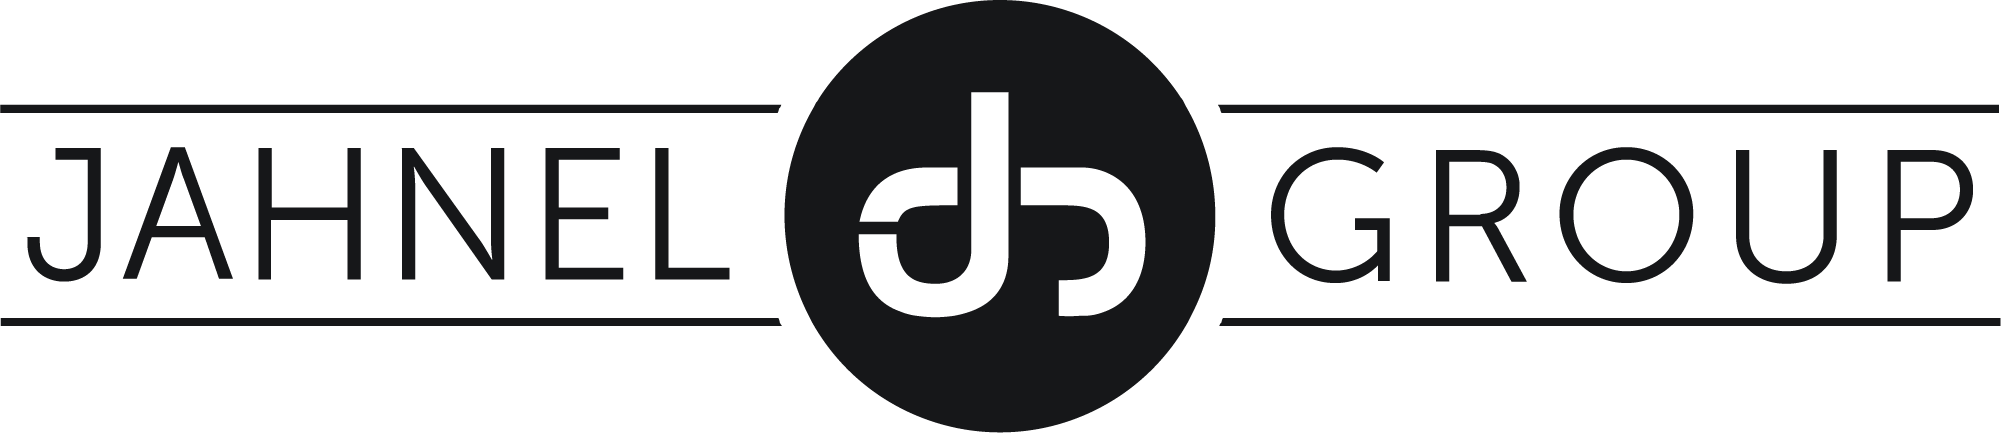 Jahnel Group, Inc. logo